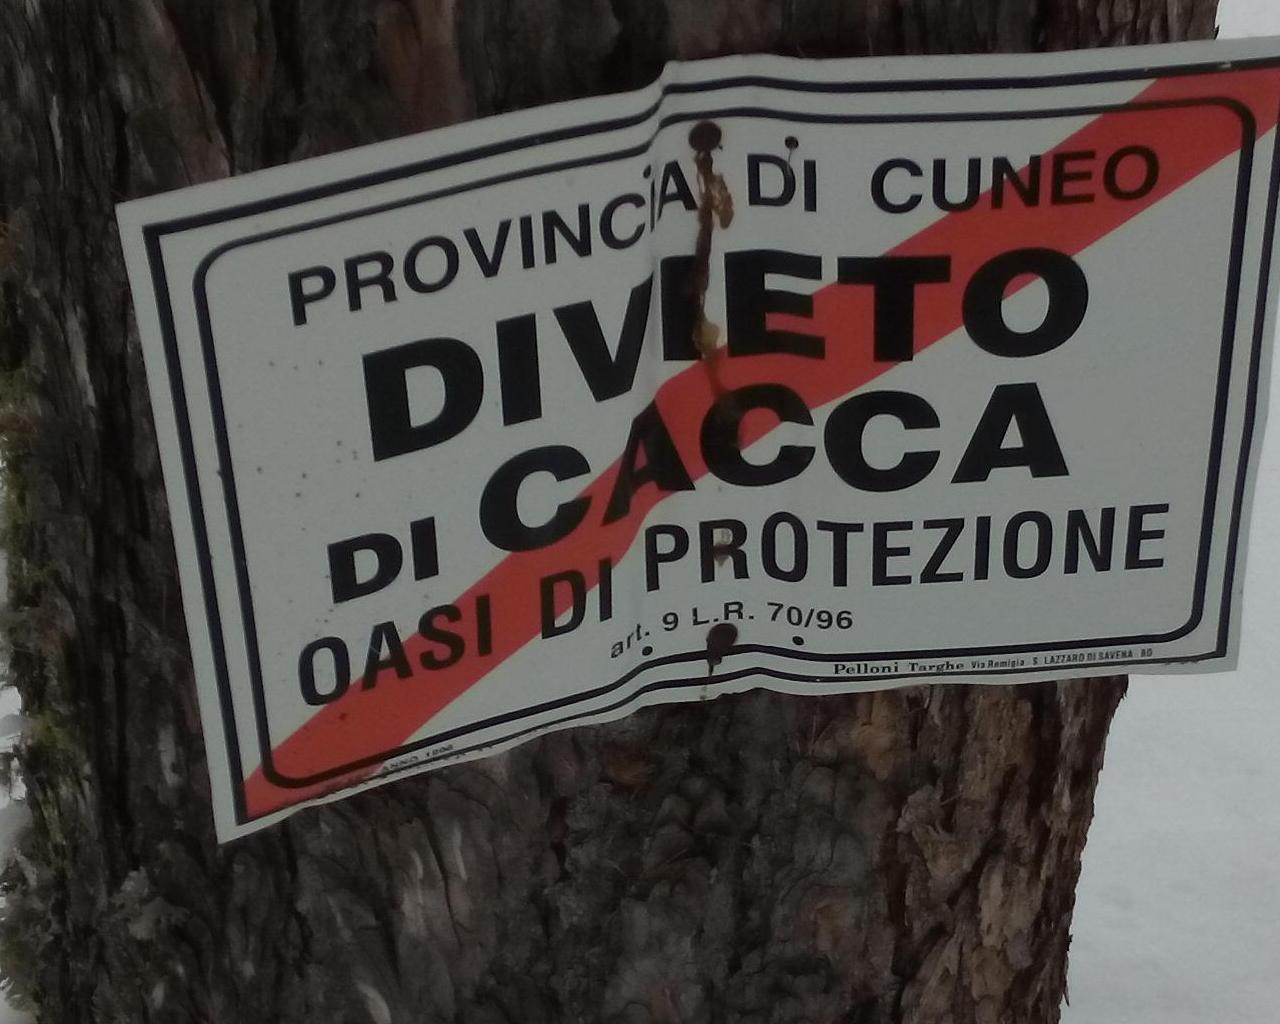 DivietoDiCacca.JPG